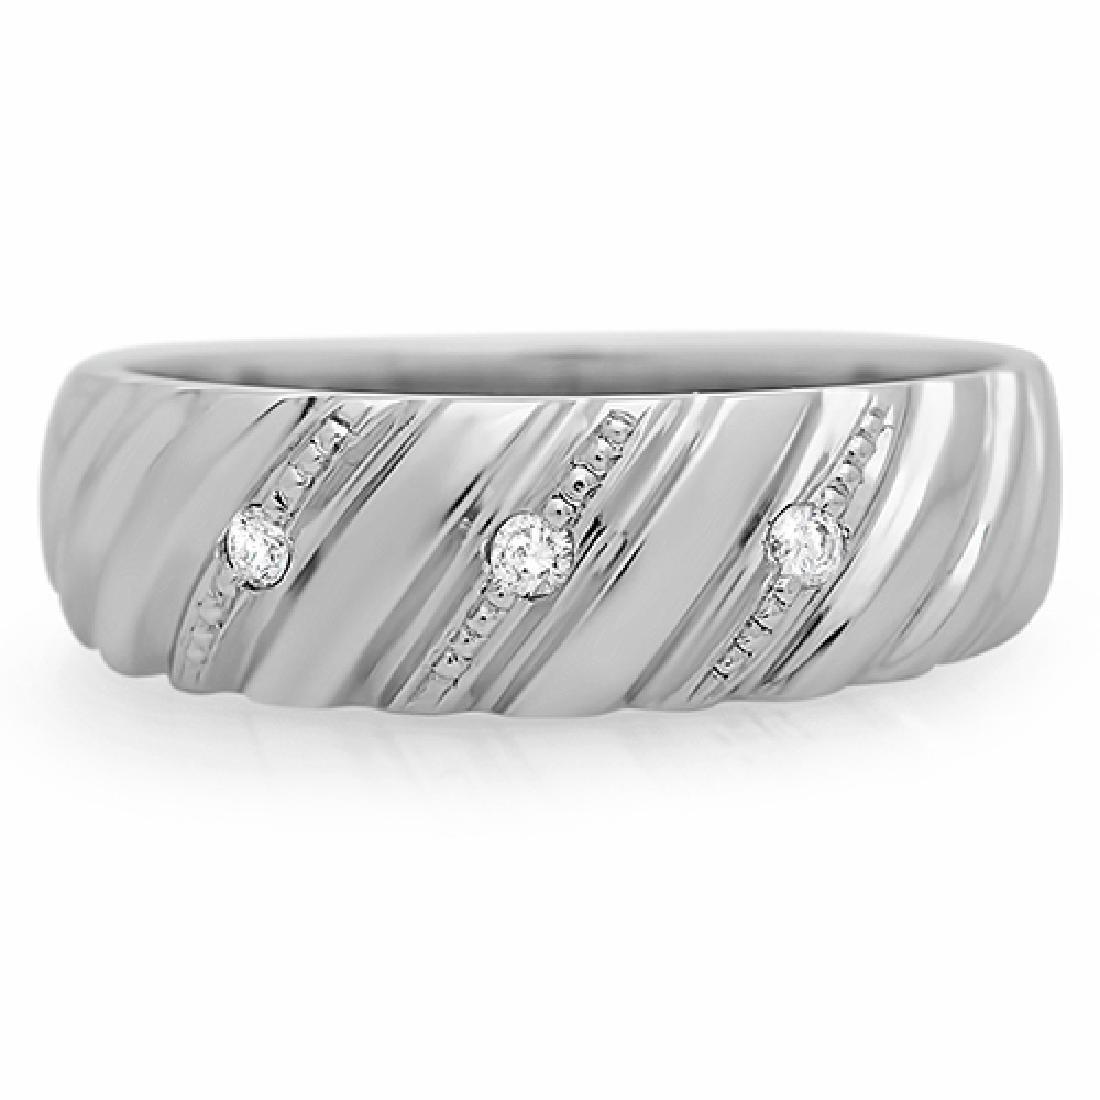 Mens 0.05 Carat Natural Diamond 18K Solid White Gold